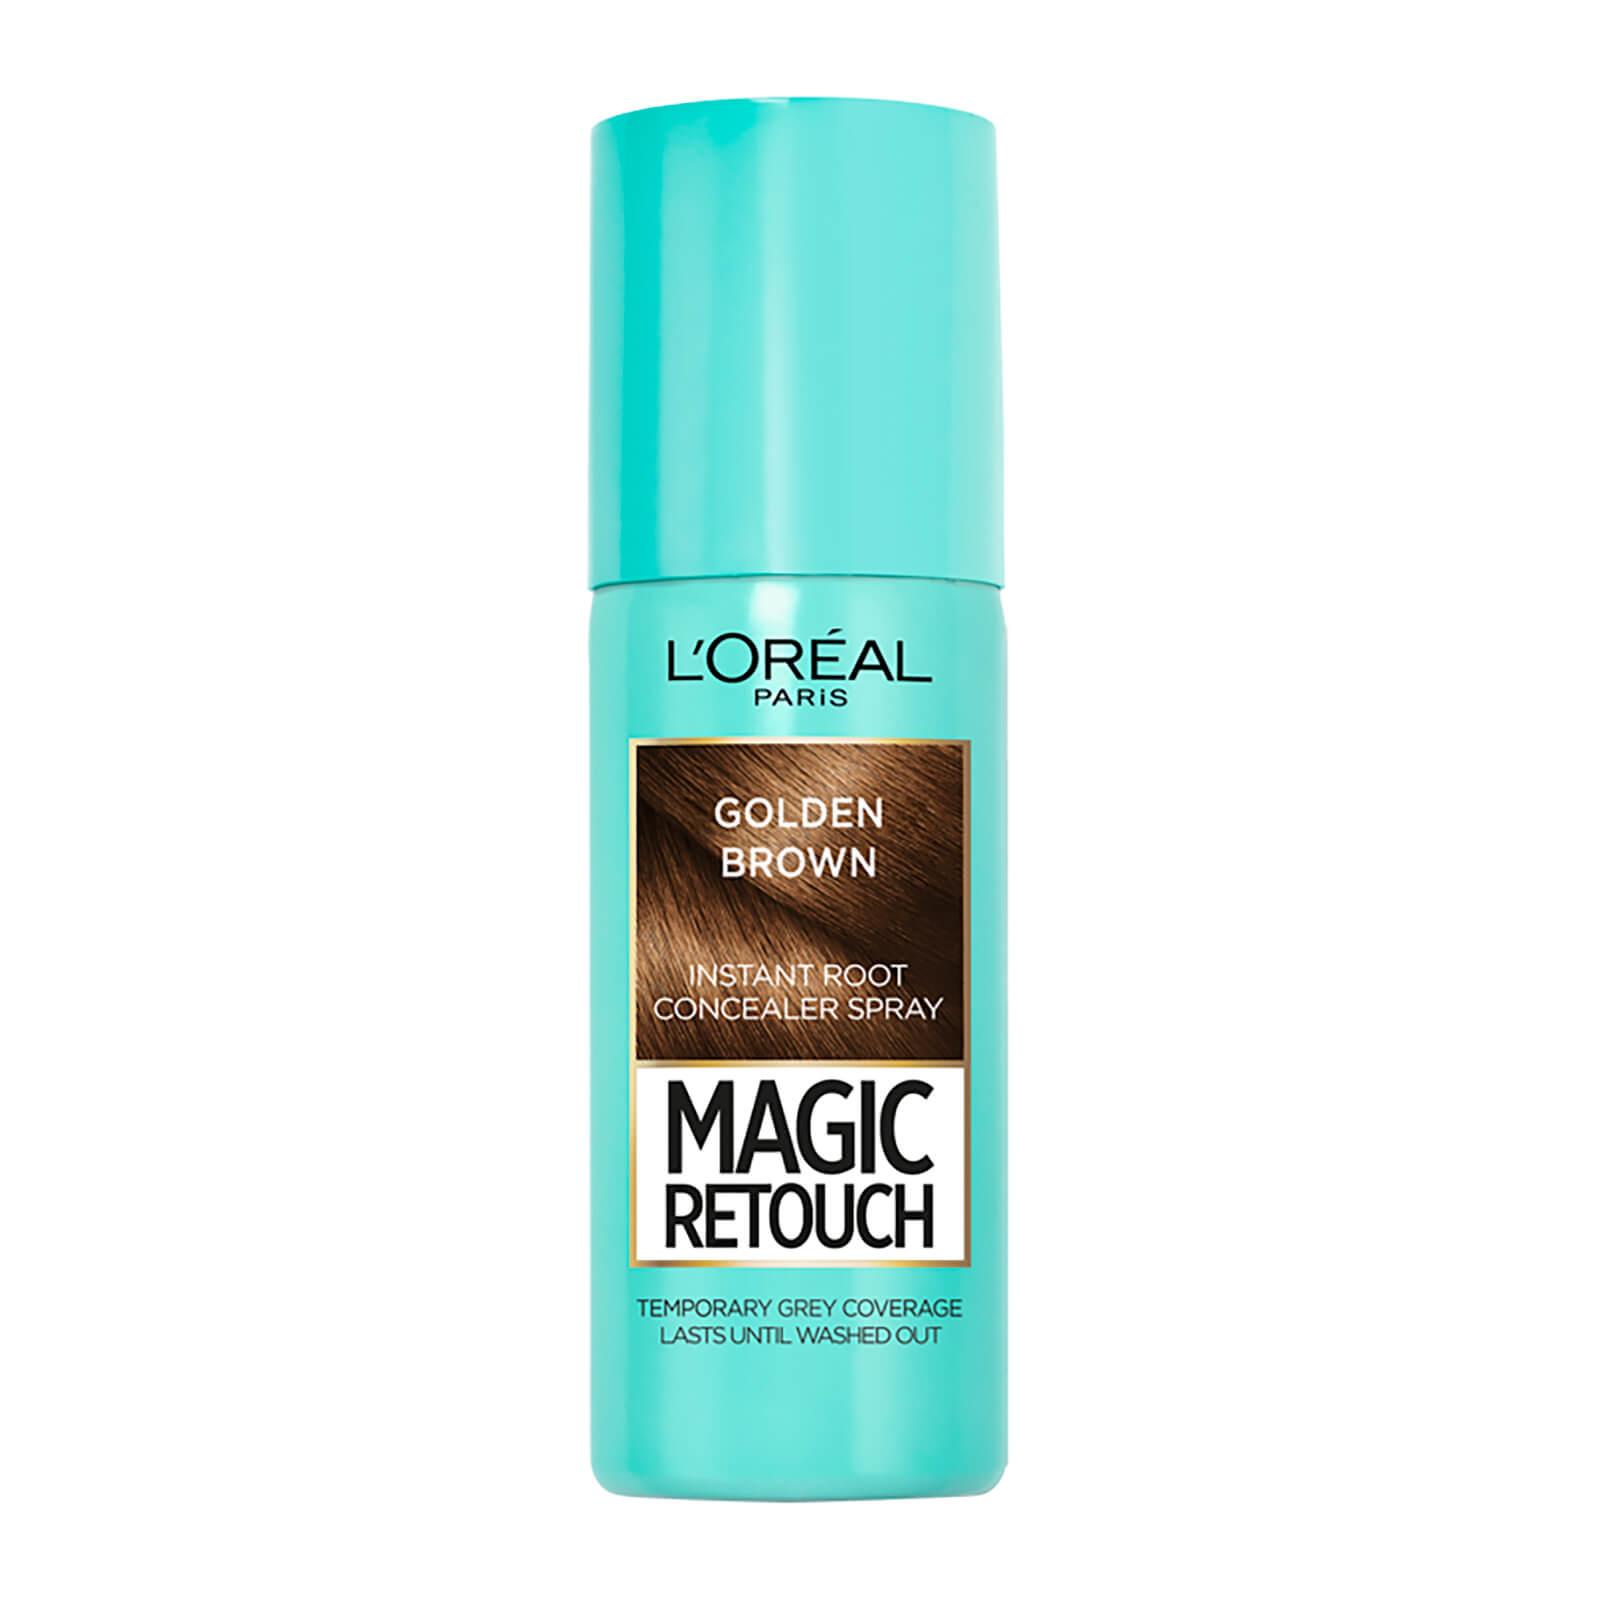 L'Oréal Paris Magic Retouch Temporary Instant Root Concealer Spray 75ml (Various Shades) - Golden Brown